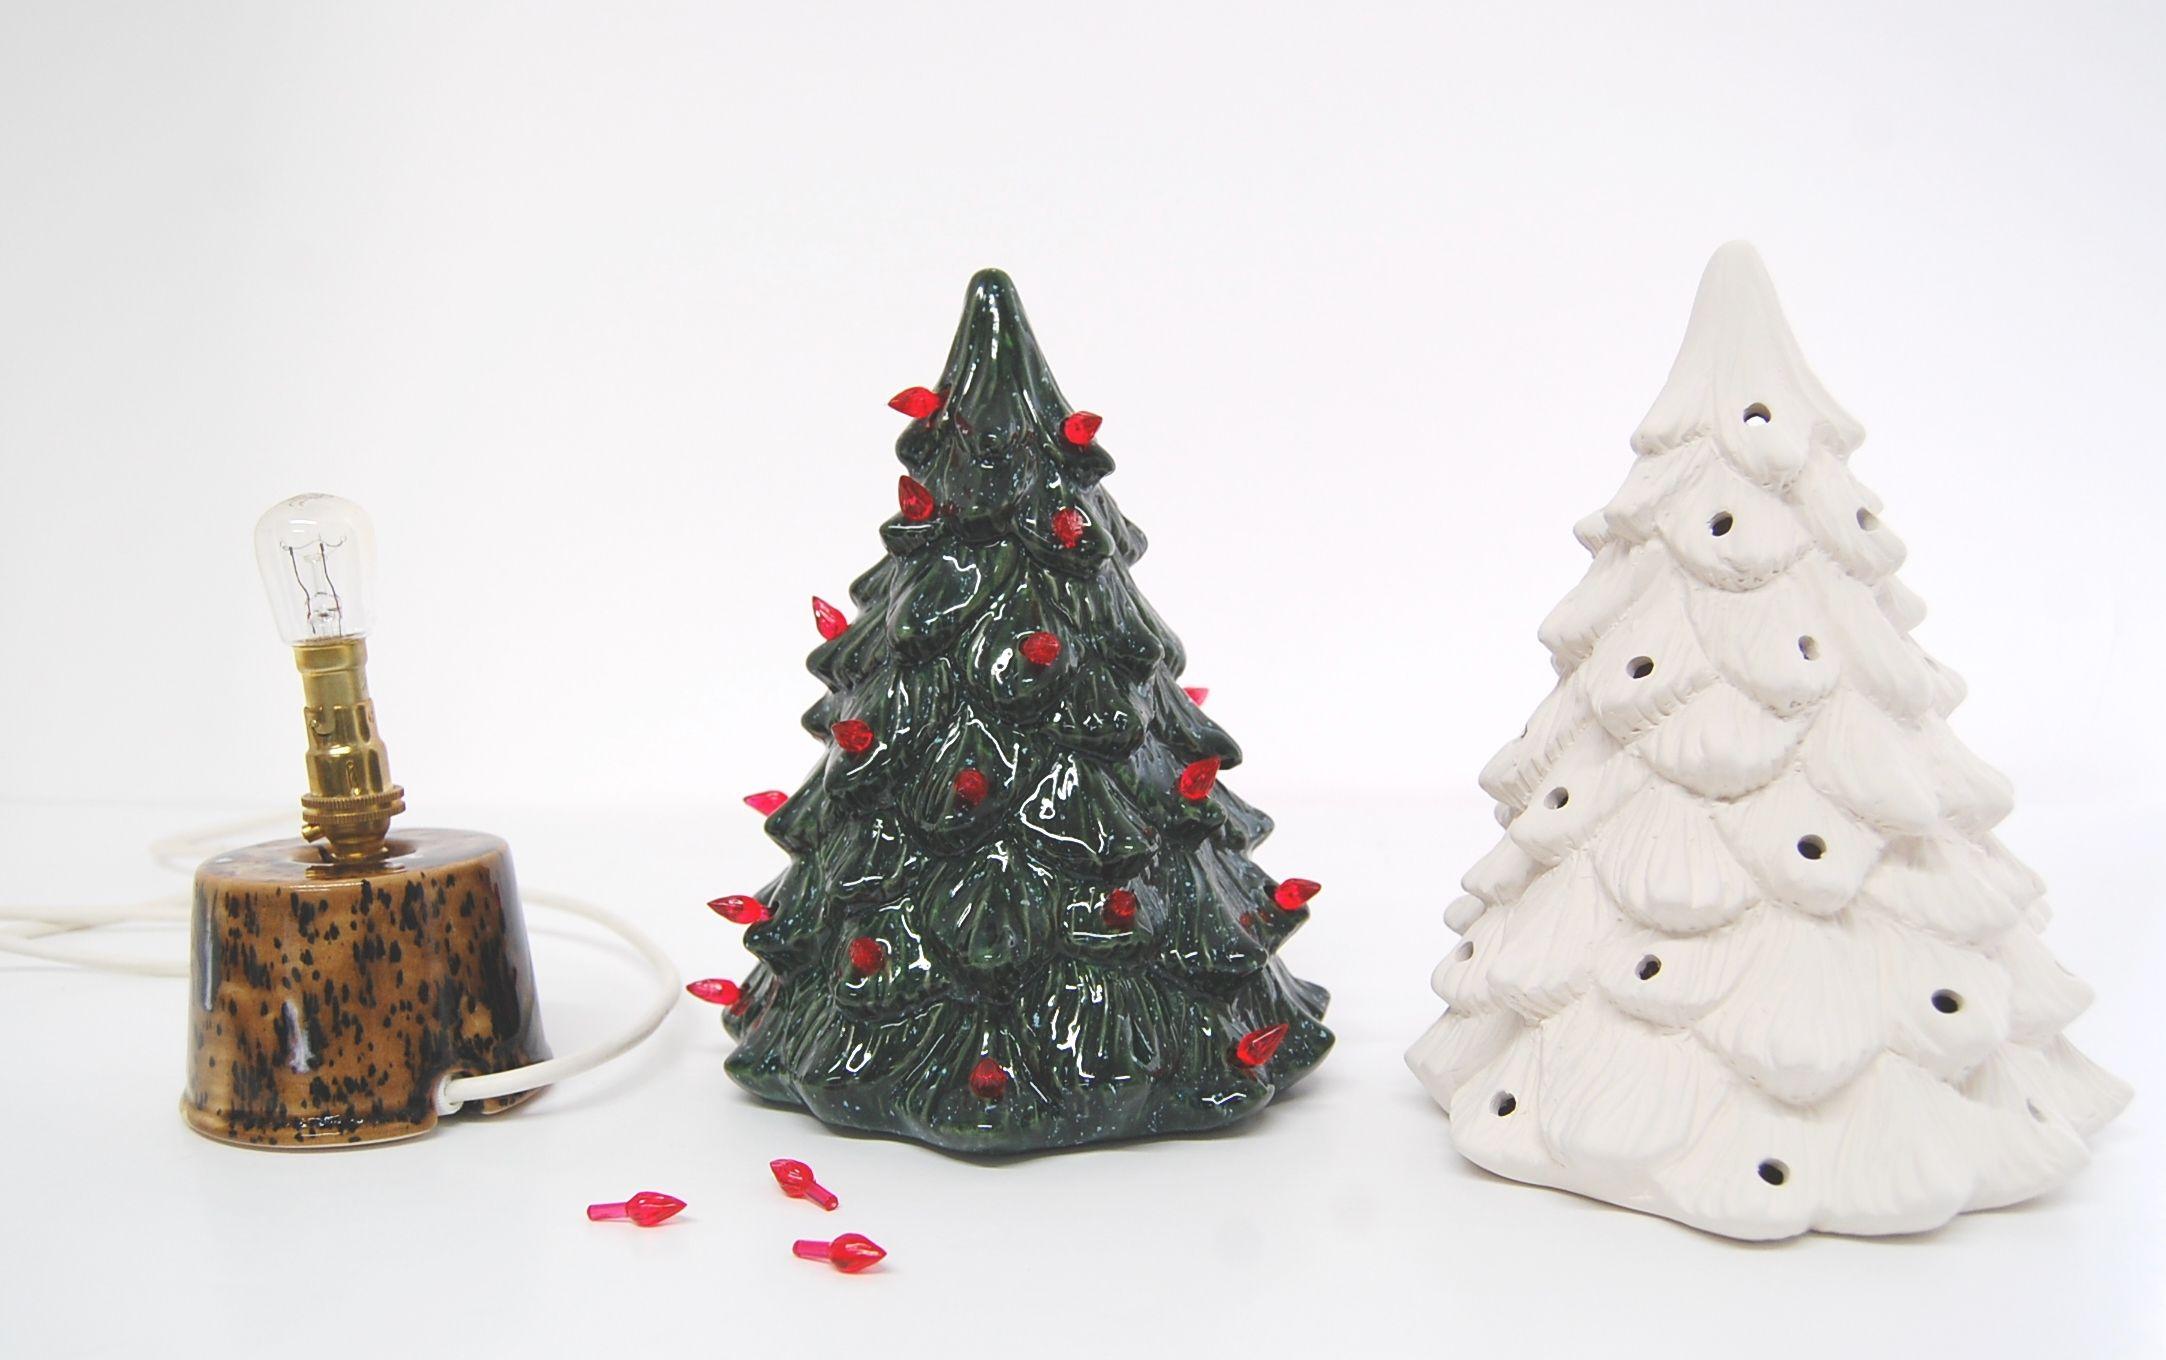 Ceramic #Pottery Vintage Tree Lamp #Christmas #Xmas ornament ...